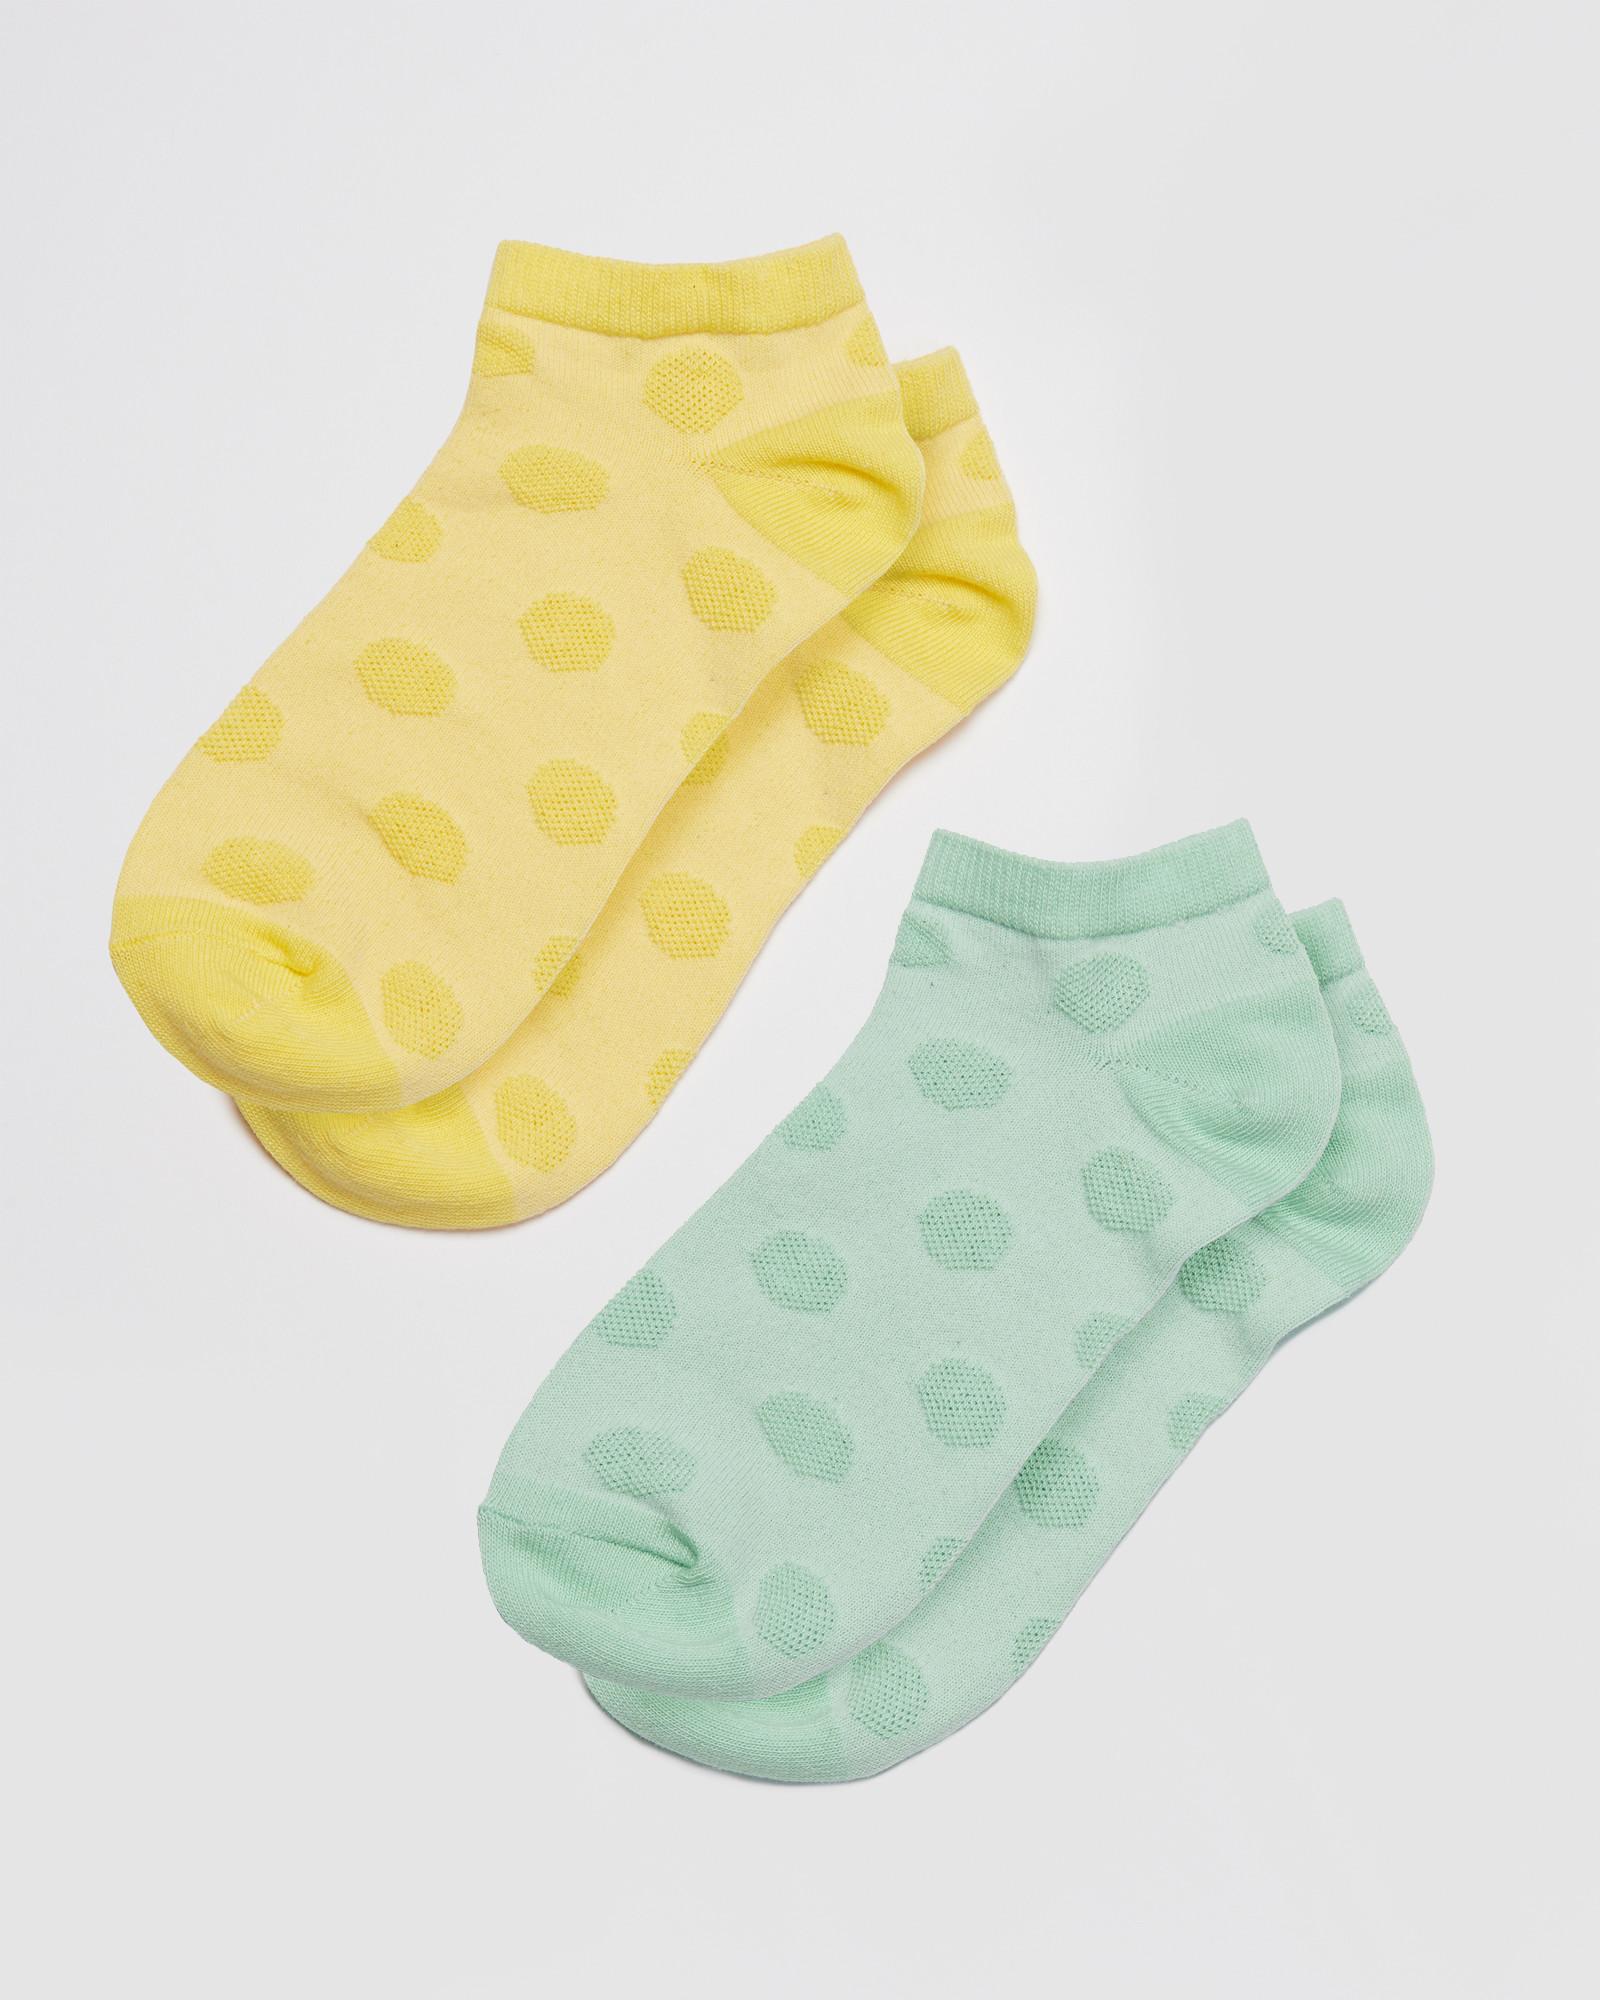 3 PACK Size: 4-7 Hearts Design Trainer Socks